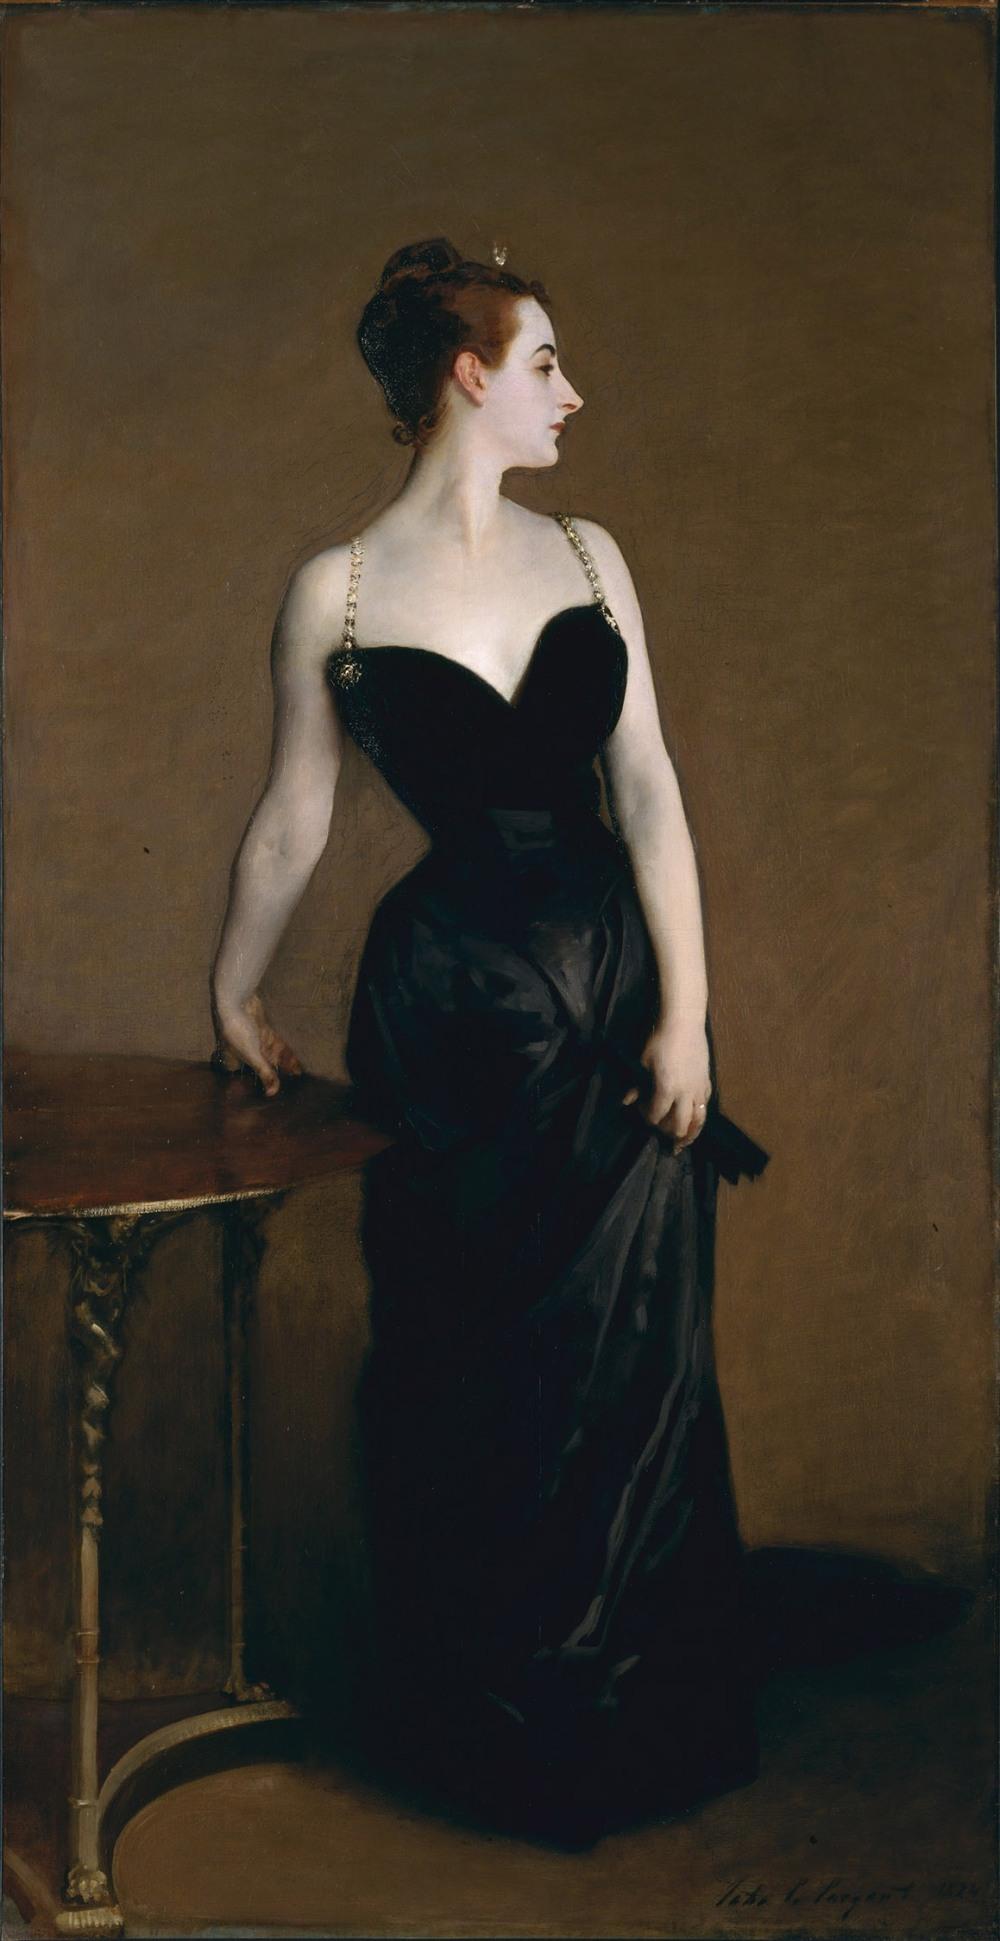 John Singer Sargent. Madame X. Hacia 1883-1884. Metropolitan Museum. Nueva York.